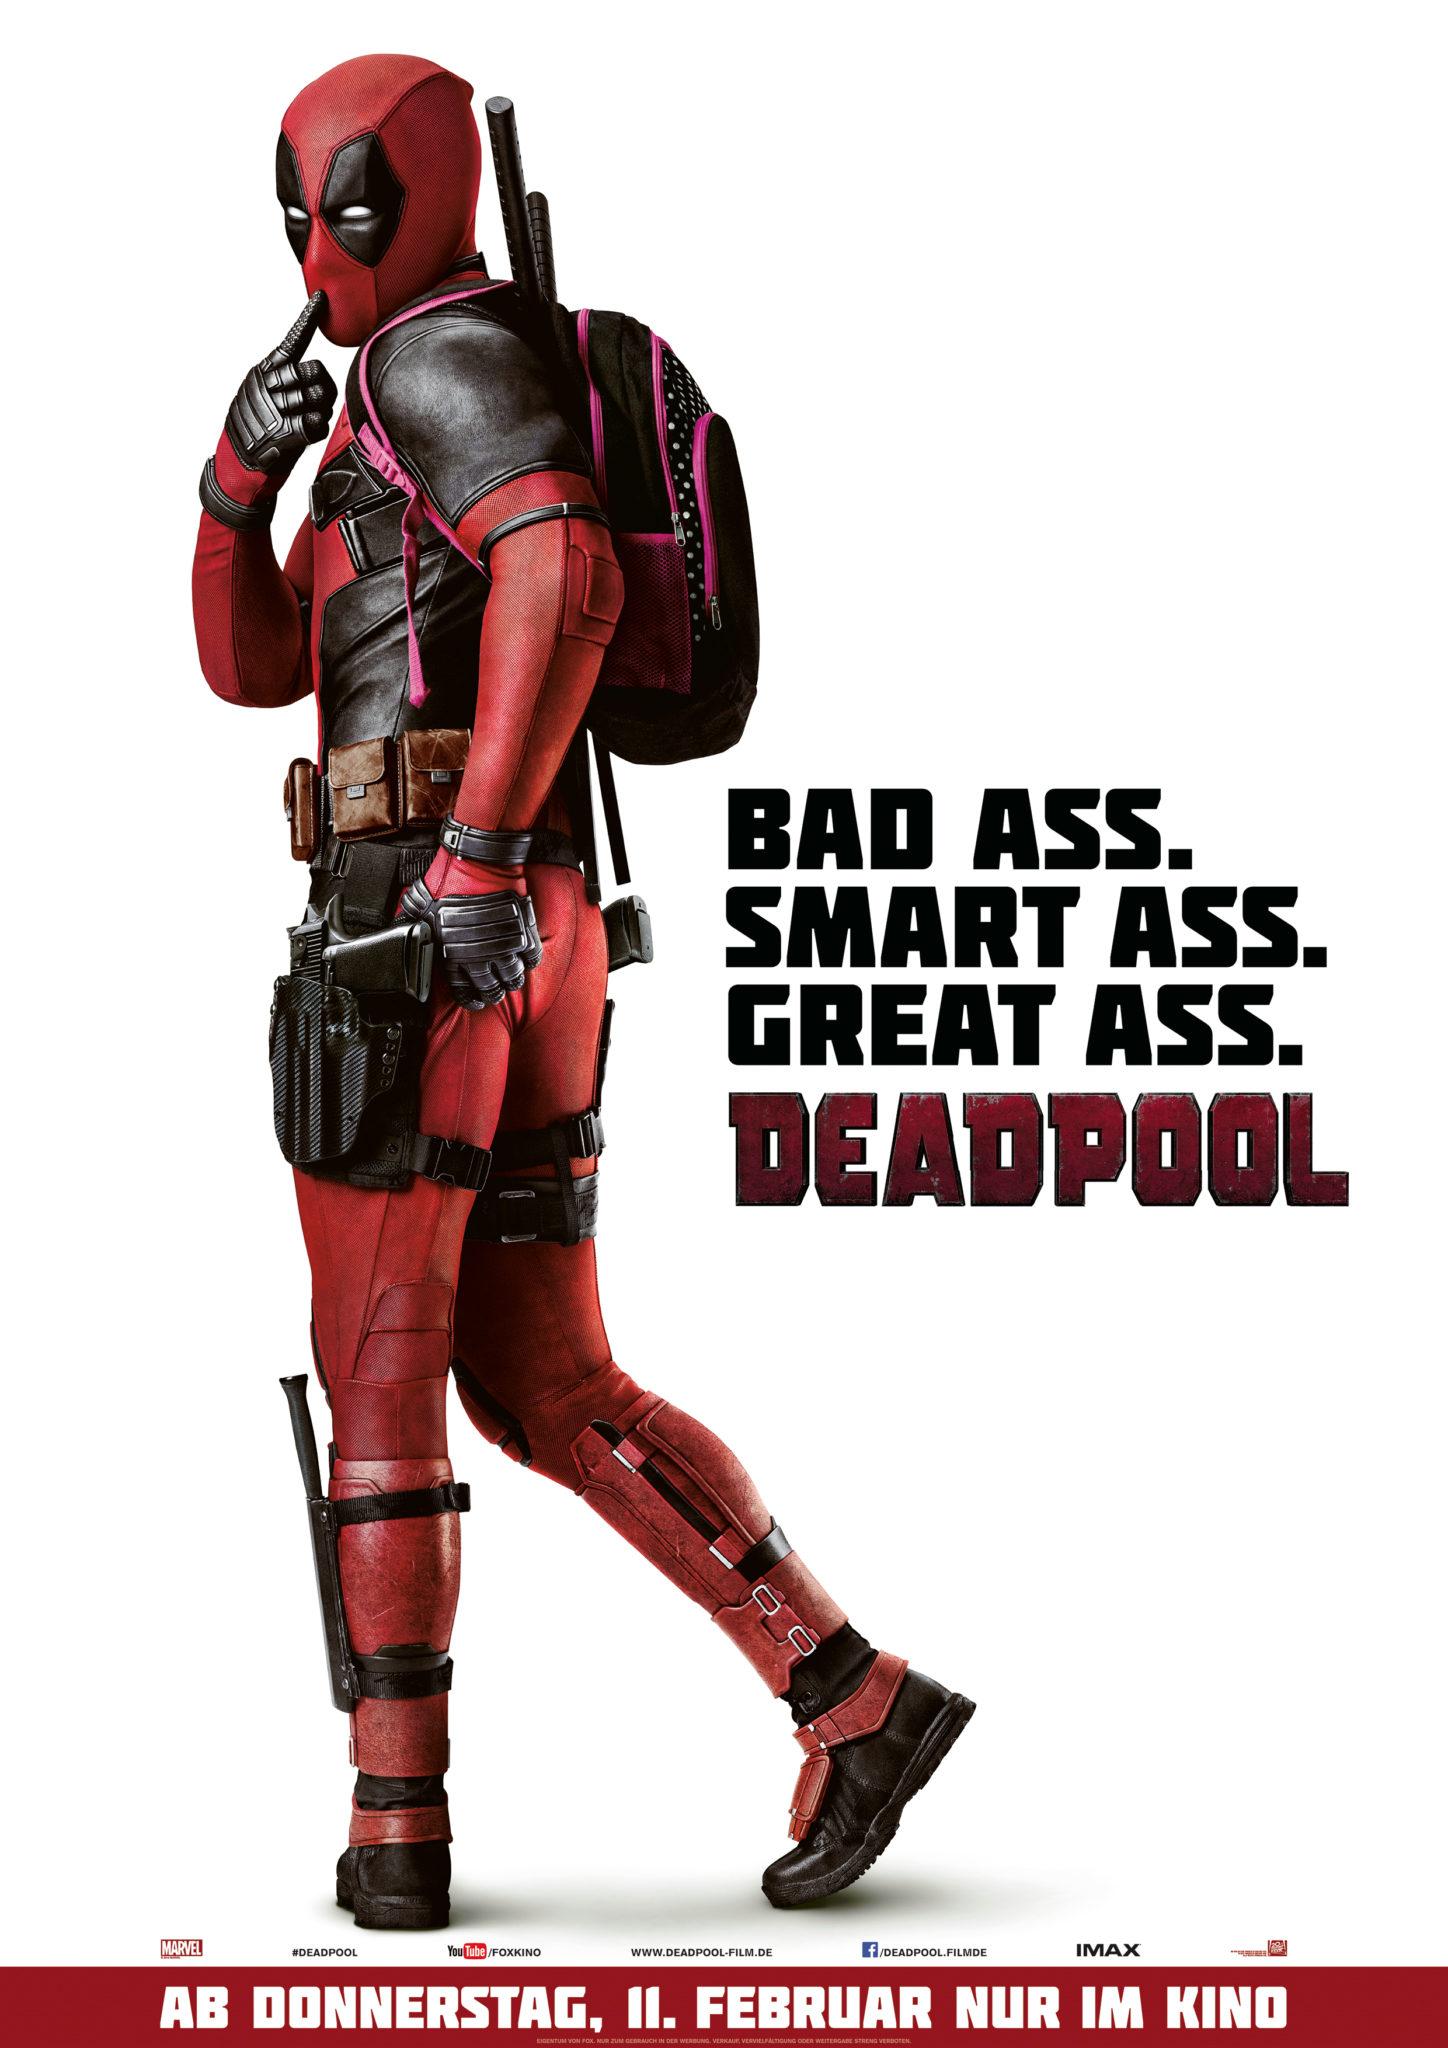 Deadpool_Poster_CampC_IMAX_SundL_A4